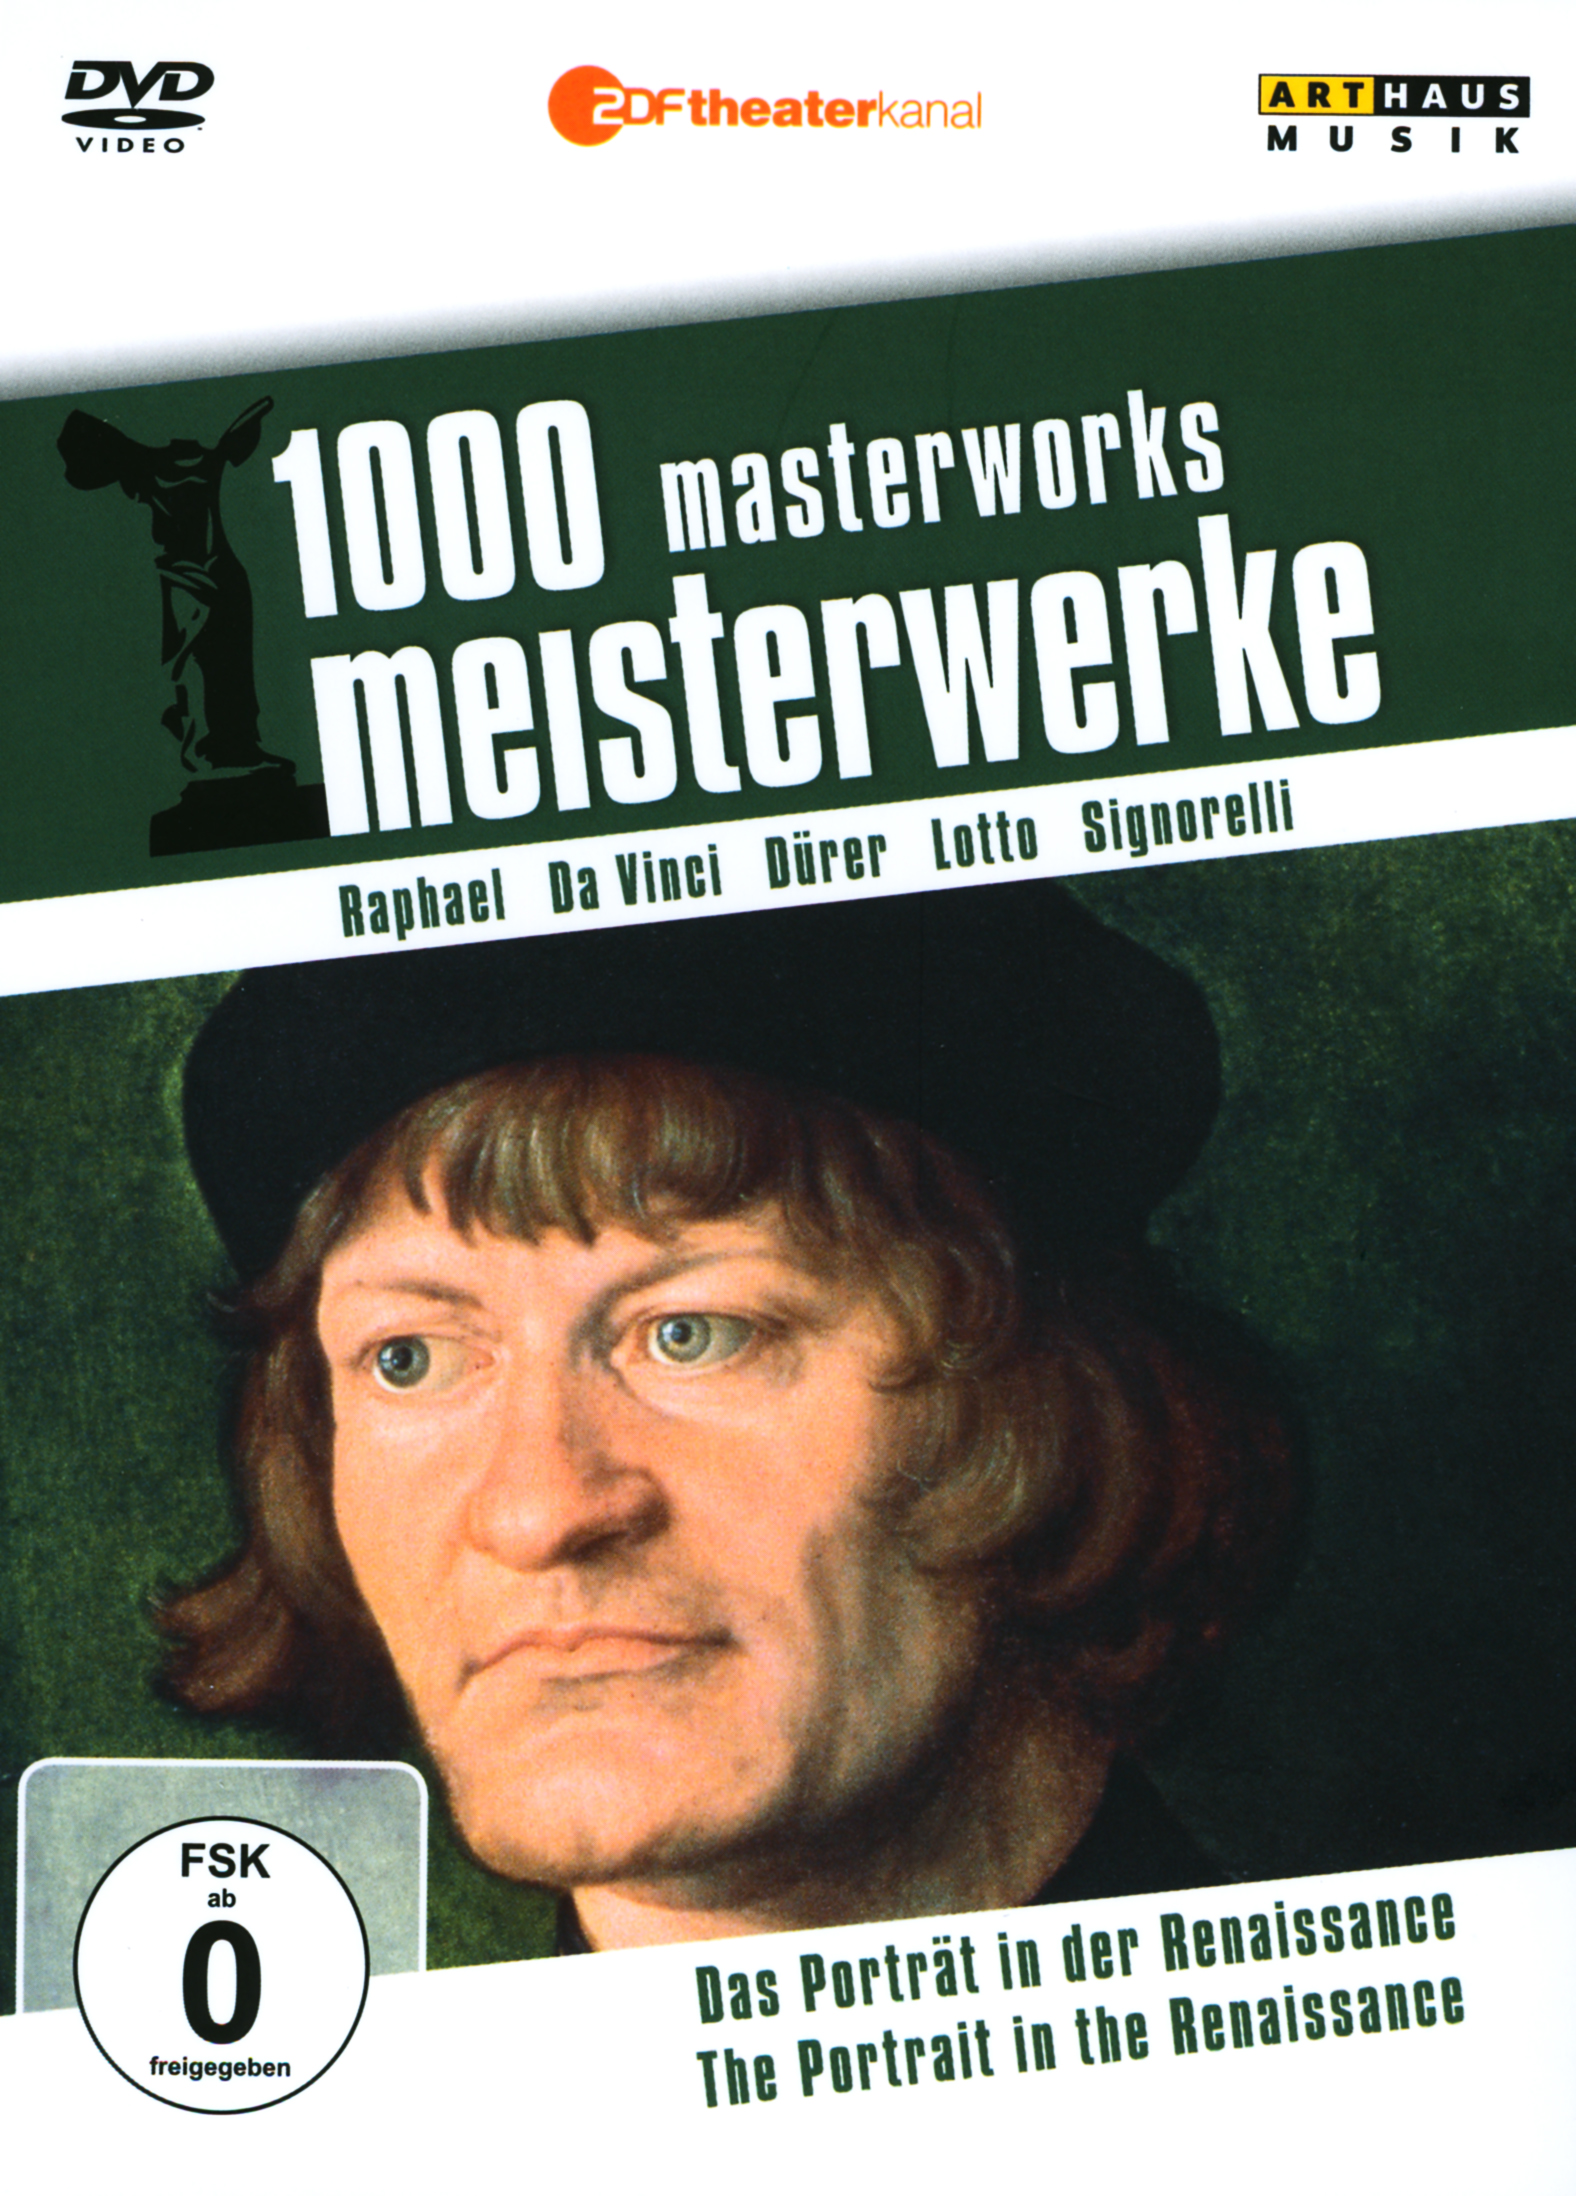 1000 Masterworks: The Portrait in the Renaissance